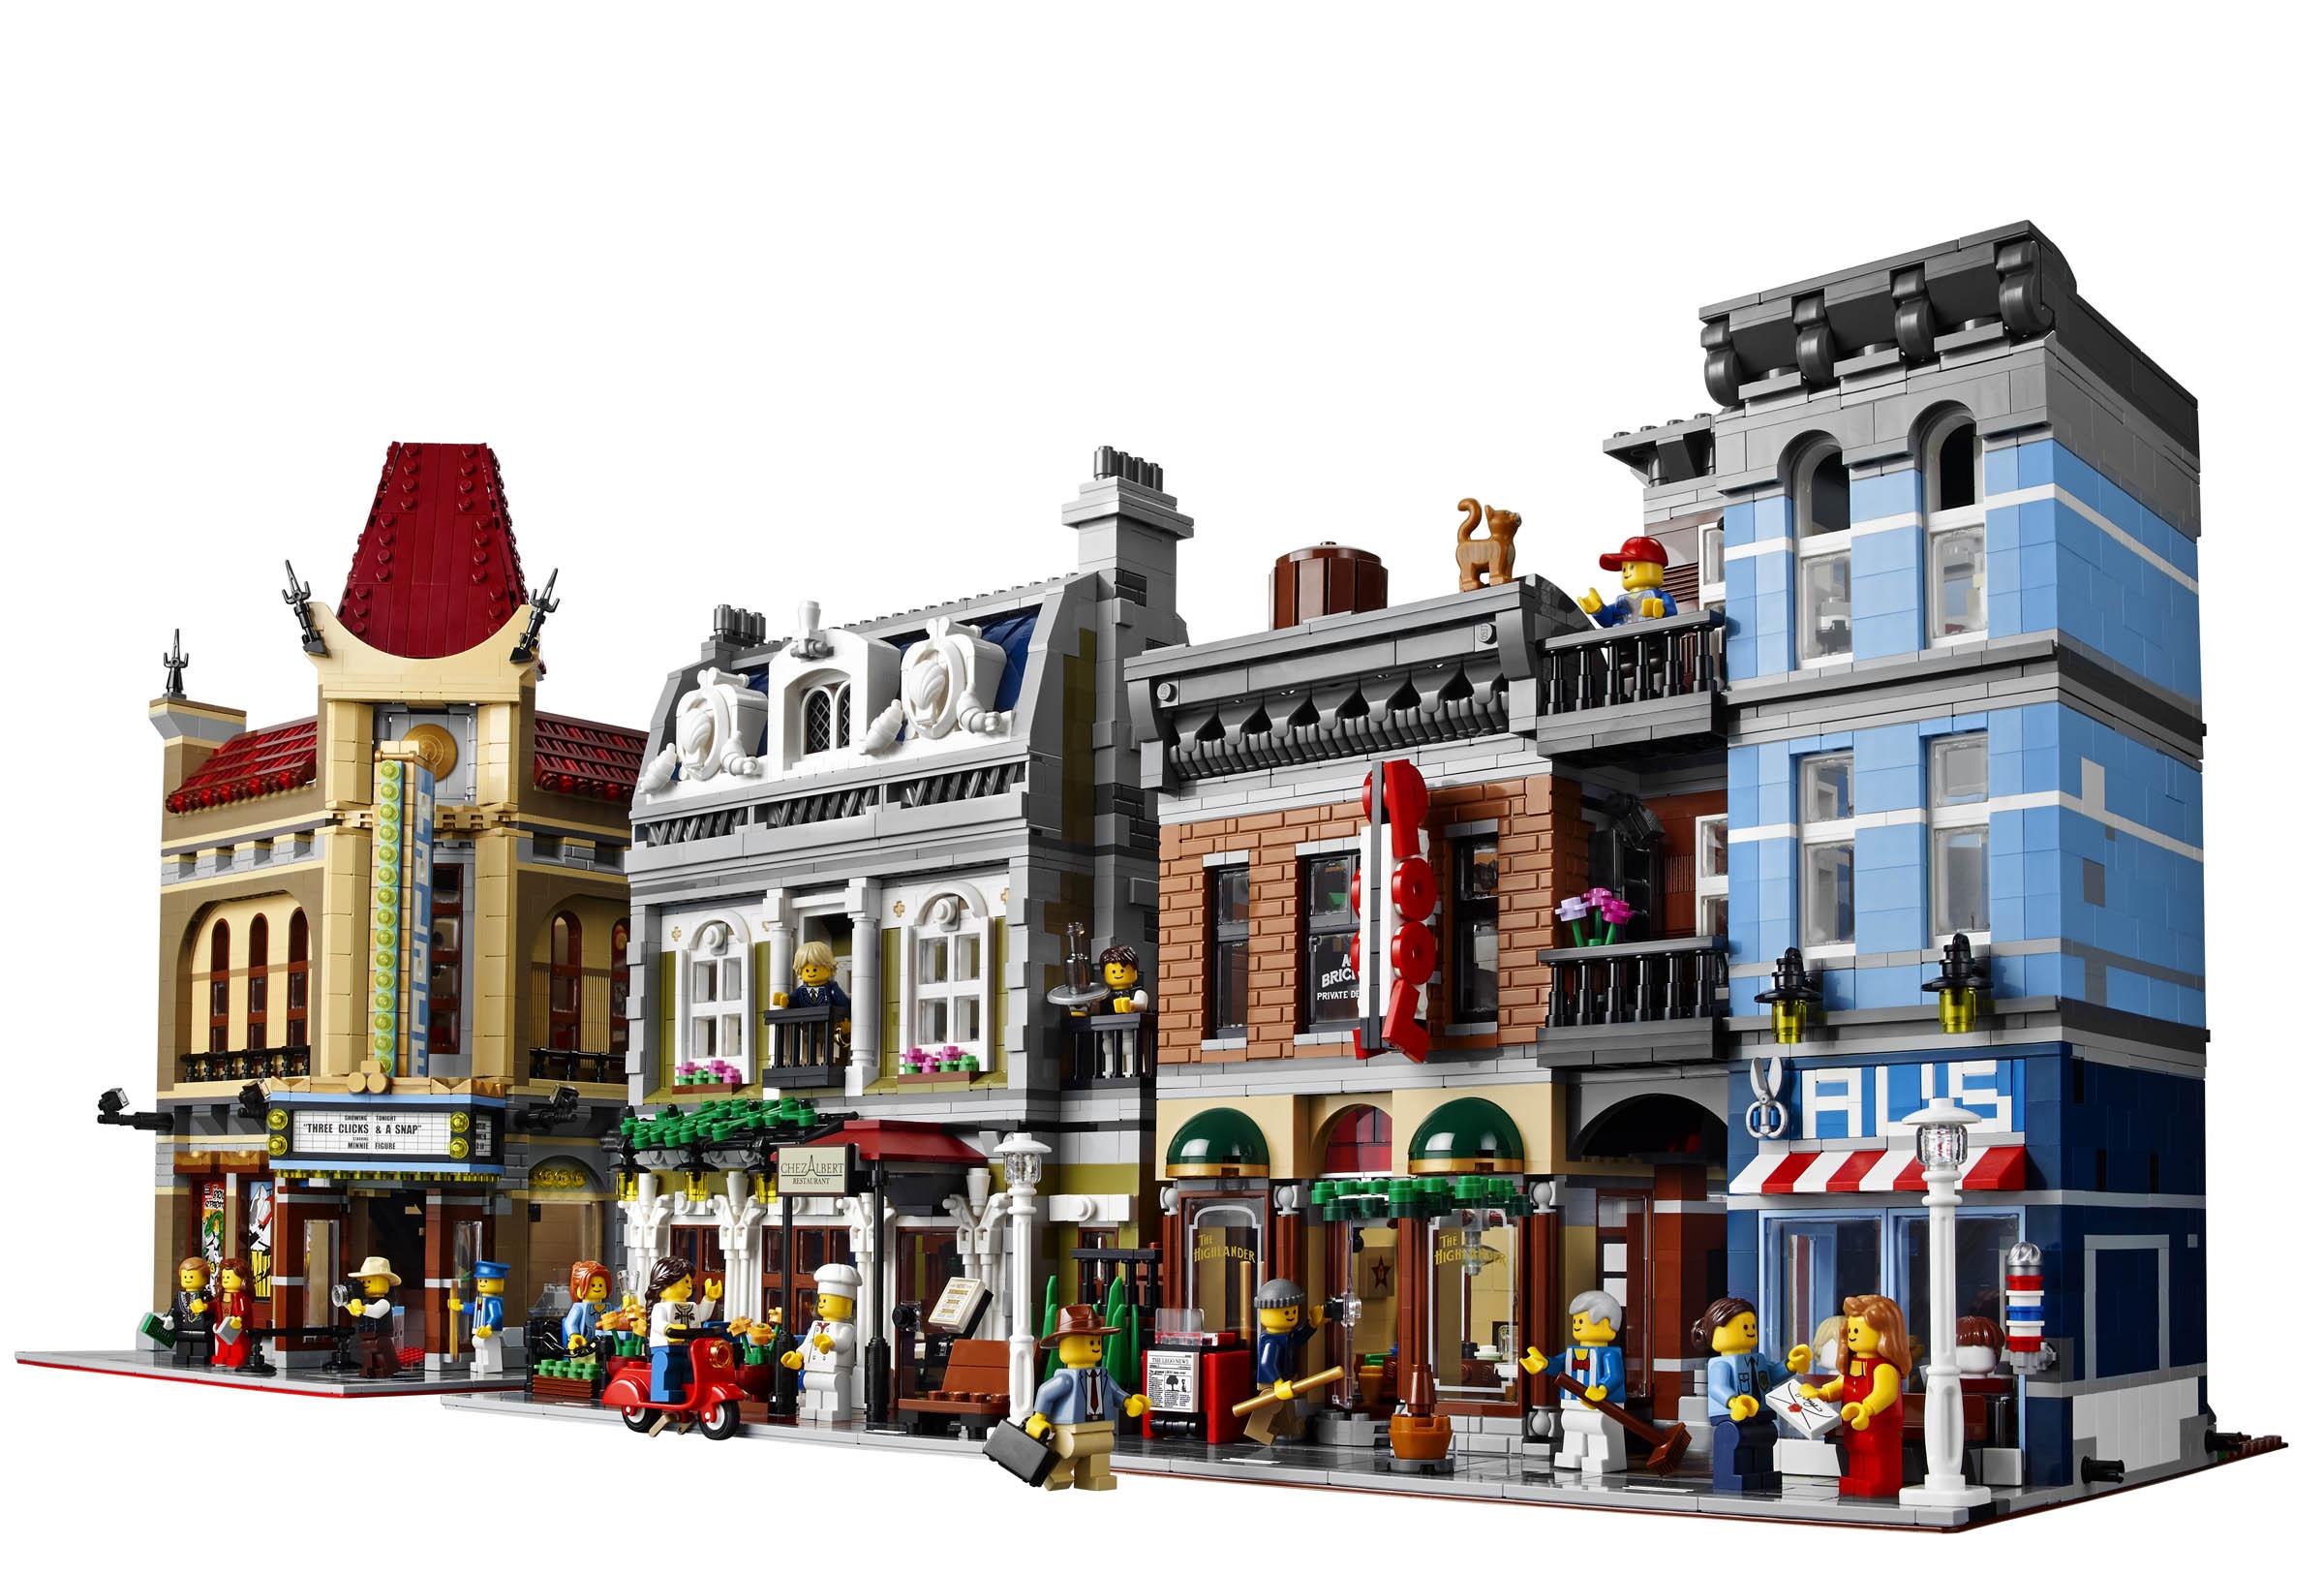 lego creator expert series 10246 detective agency new. Black Bedroom Furniture Sets. Home Design Ideas